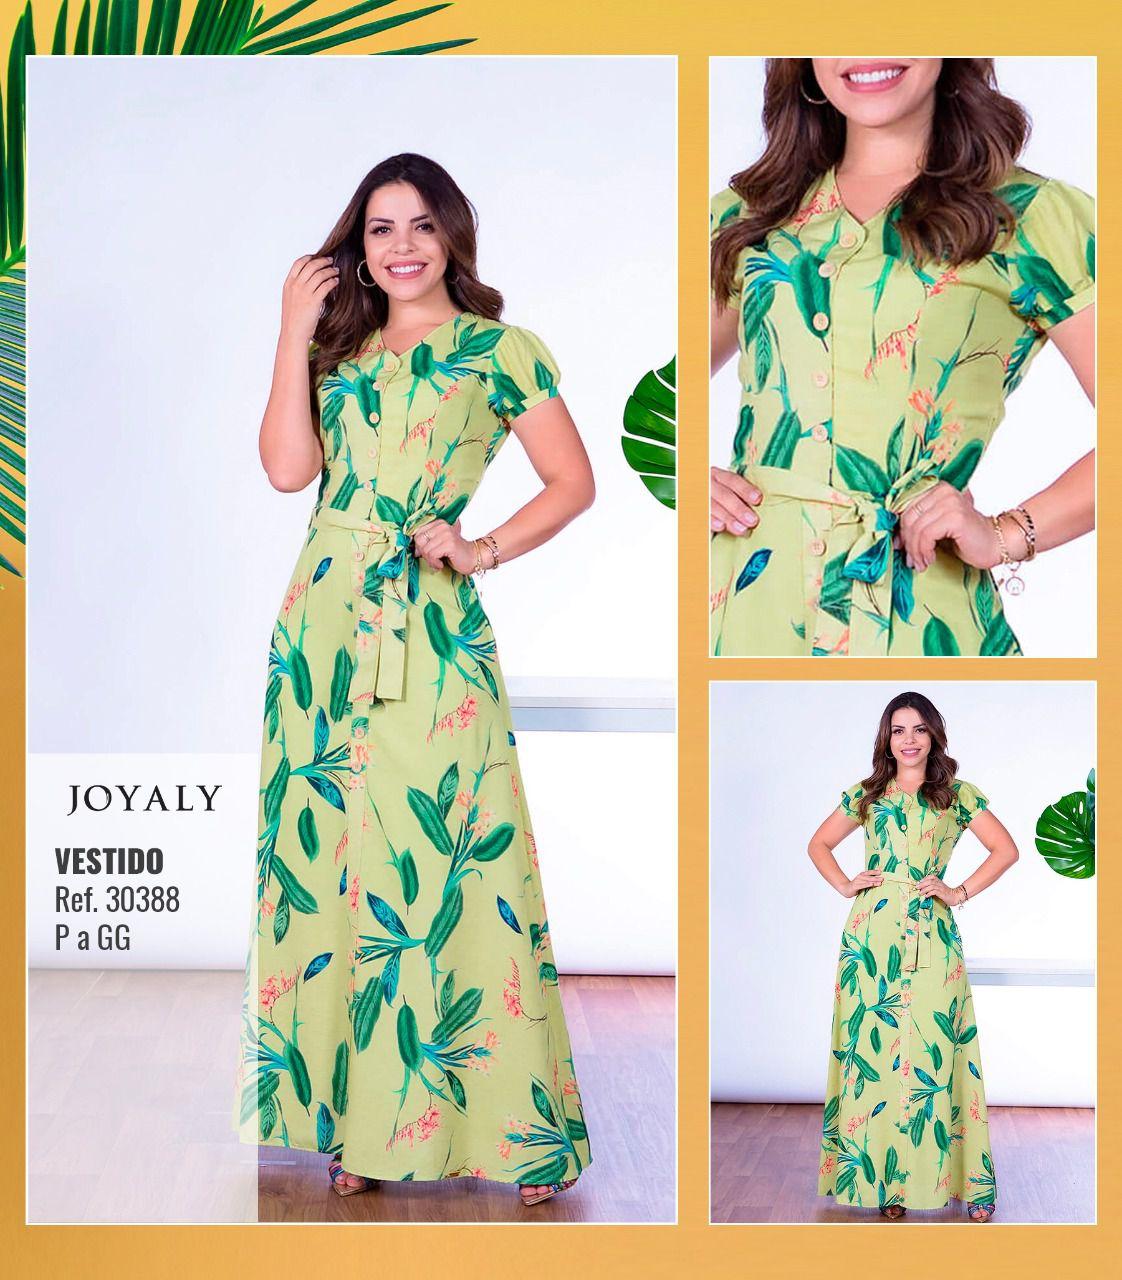 Vestido Longo - Moda Evangélica Lançto Joyaly (30388)